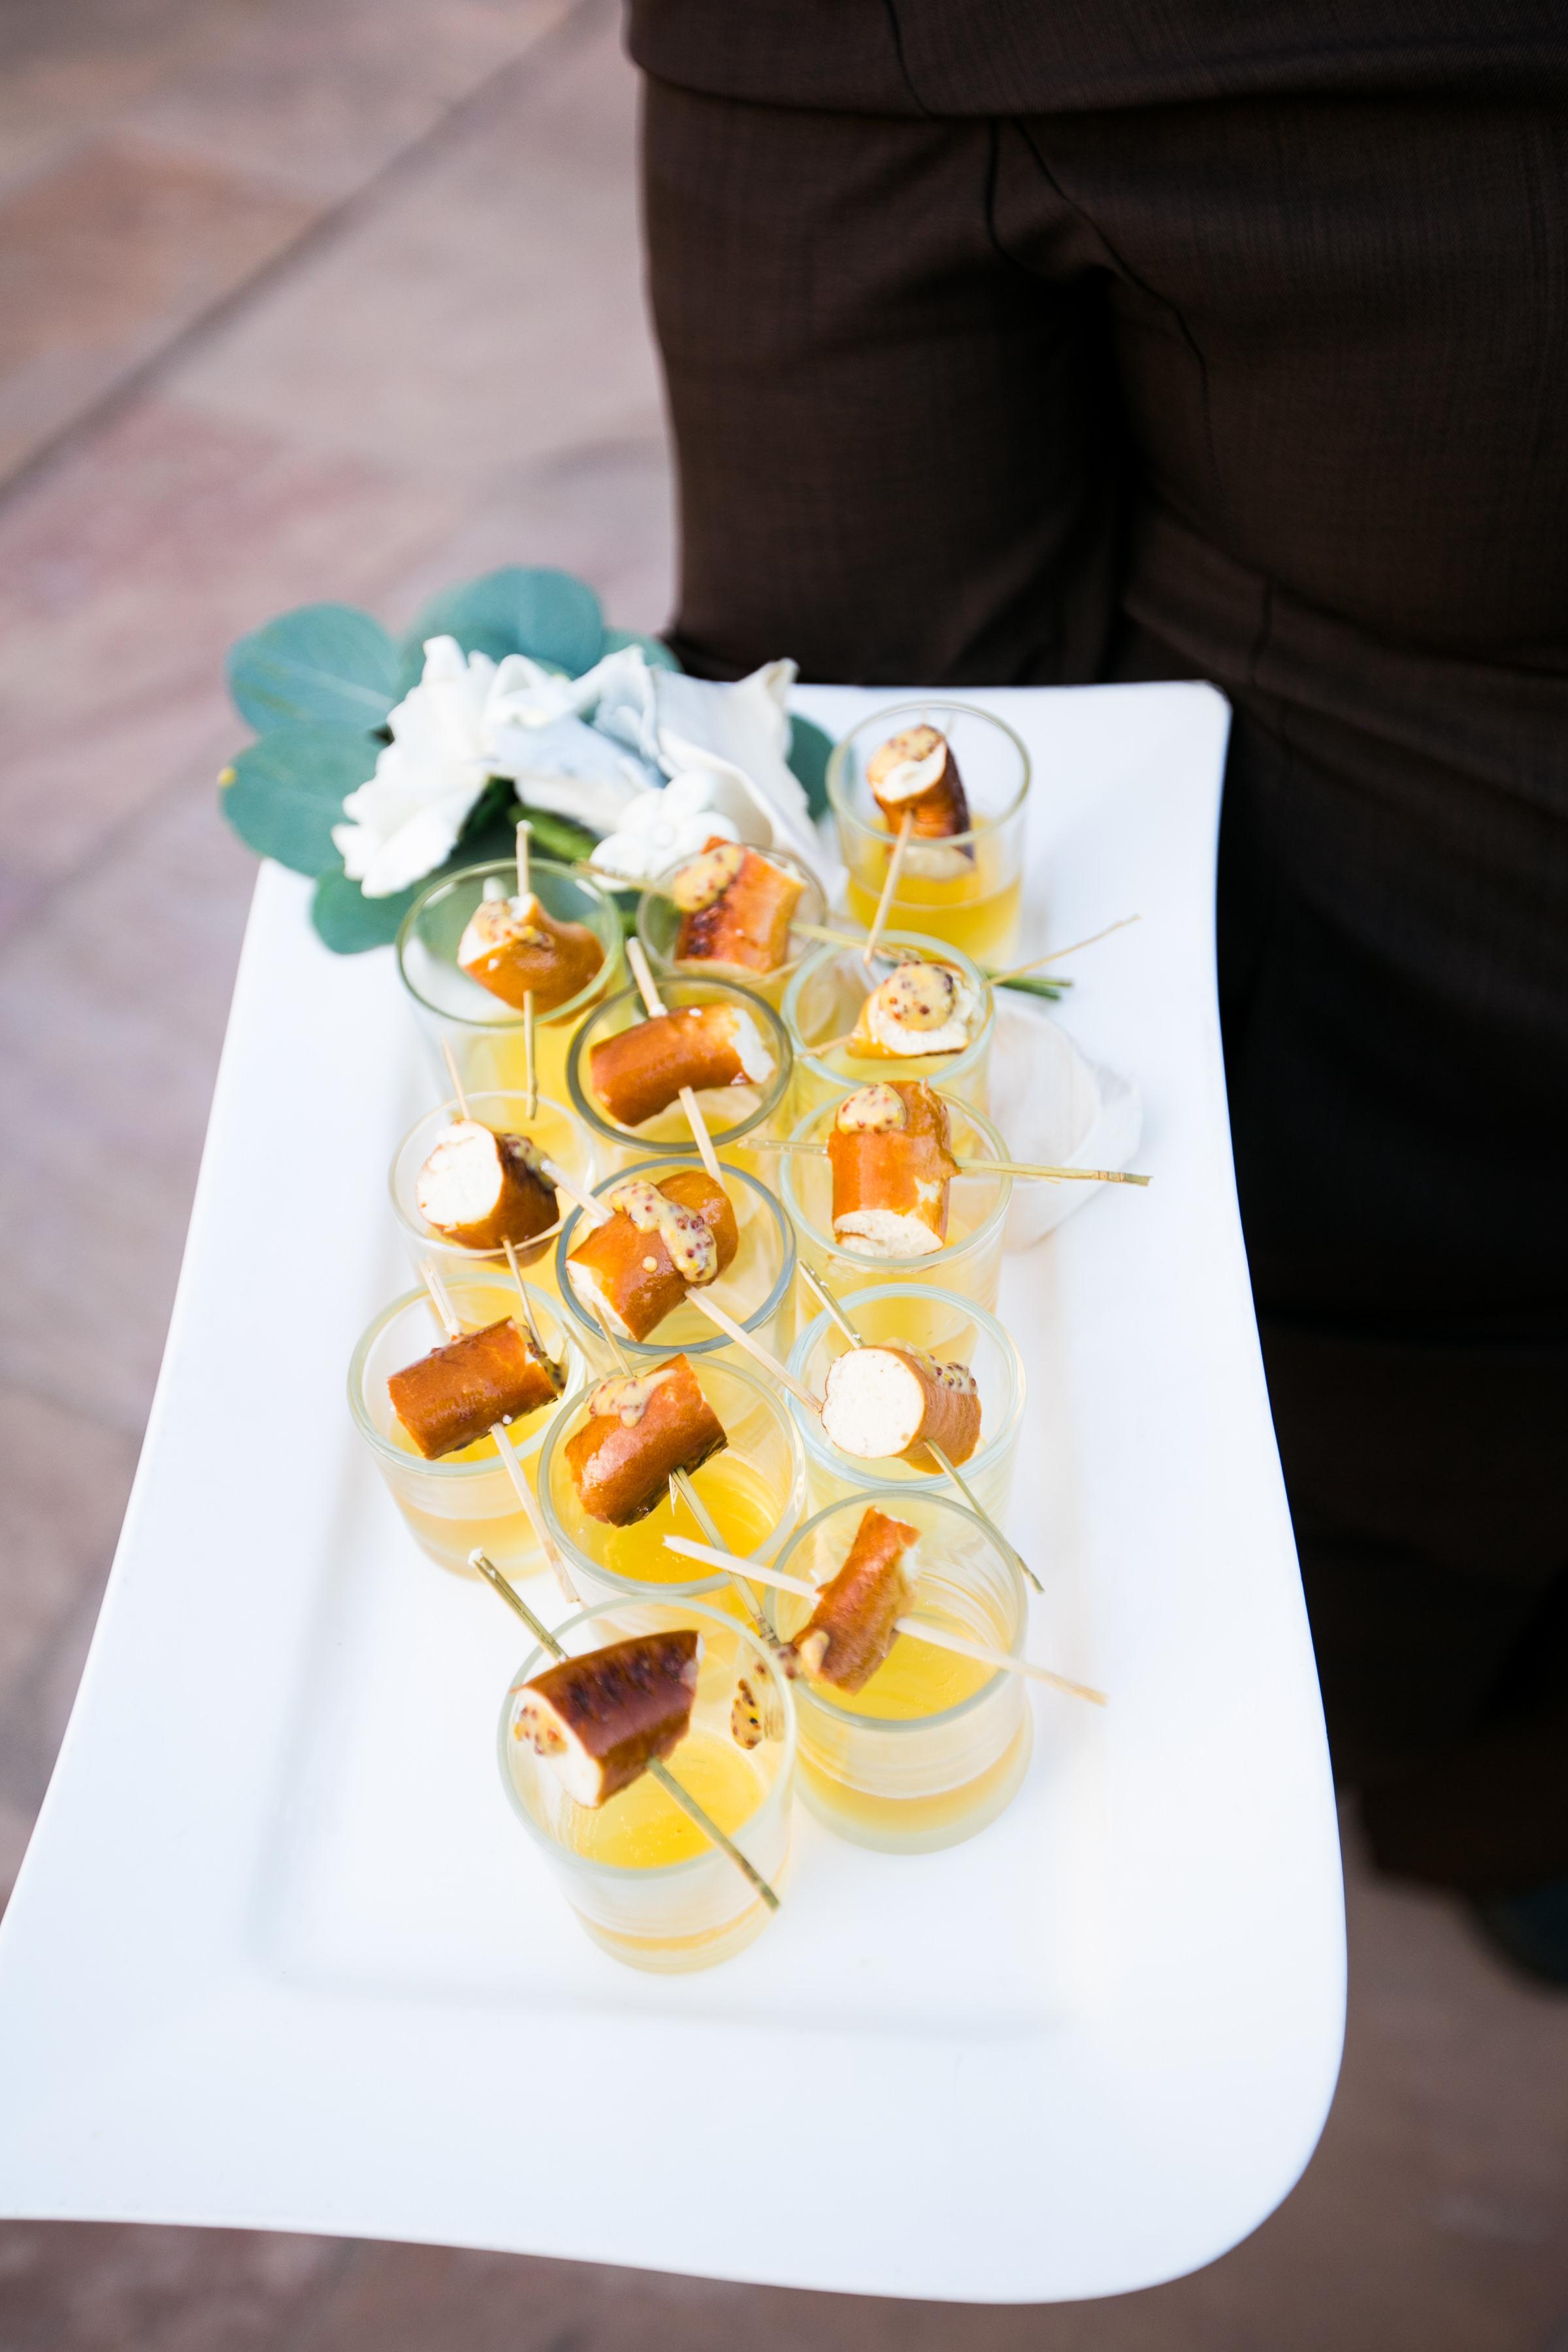 www.santabarbarawedding.com   Four Seasons Santa Barbara   Levine Fox Events   Callaway Gable Photo   Appetizers